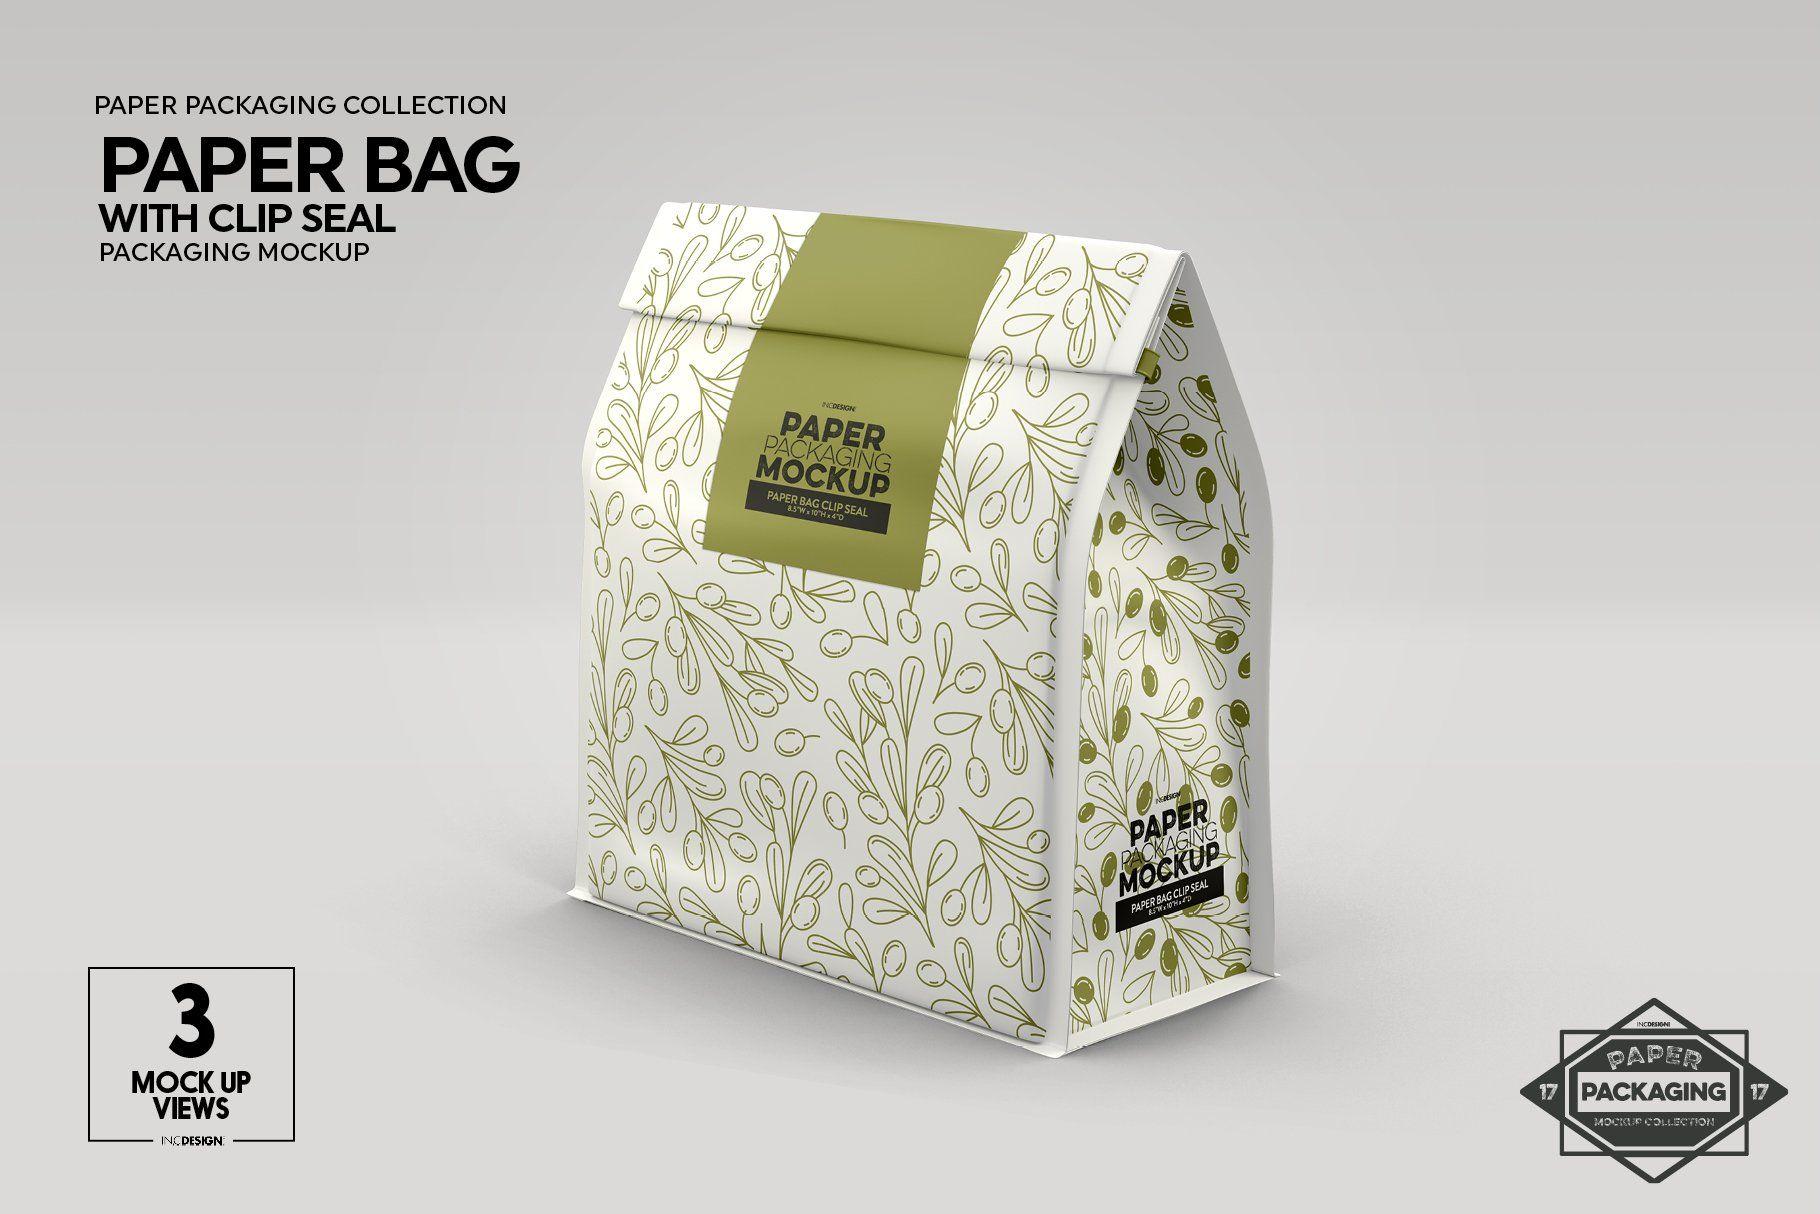 Download Paper Bags With Clip Seals Packaging Mockup 338560 Branding Design Bundles Paper Bag Design Packaging Mockup Free Packaging Mockup